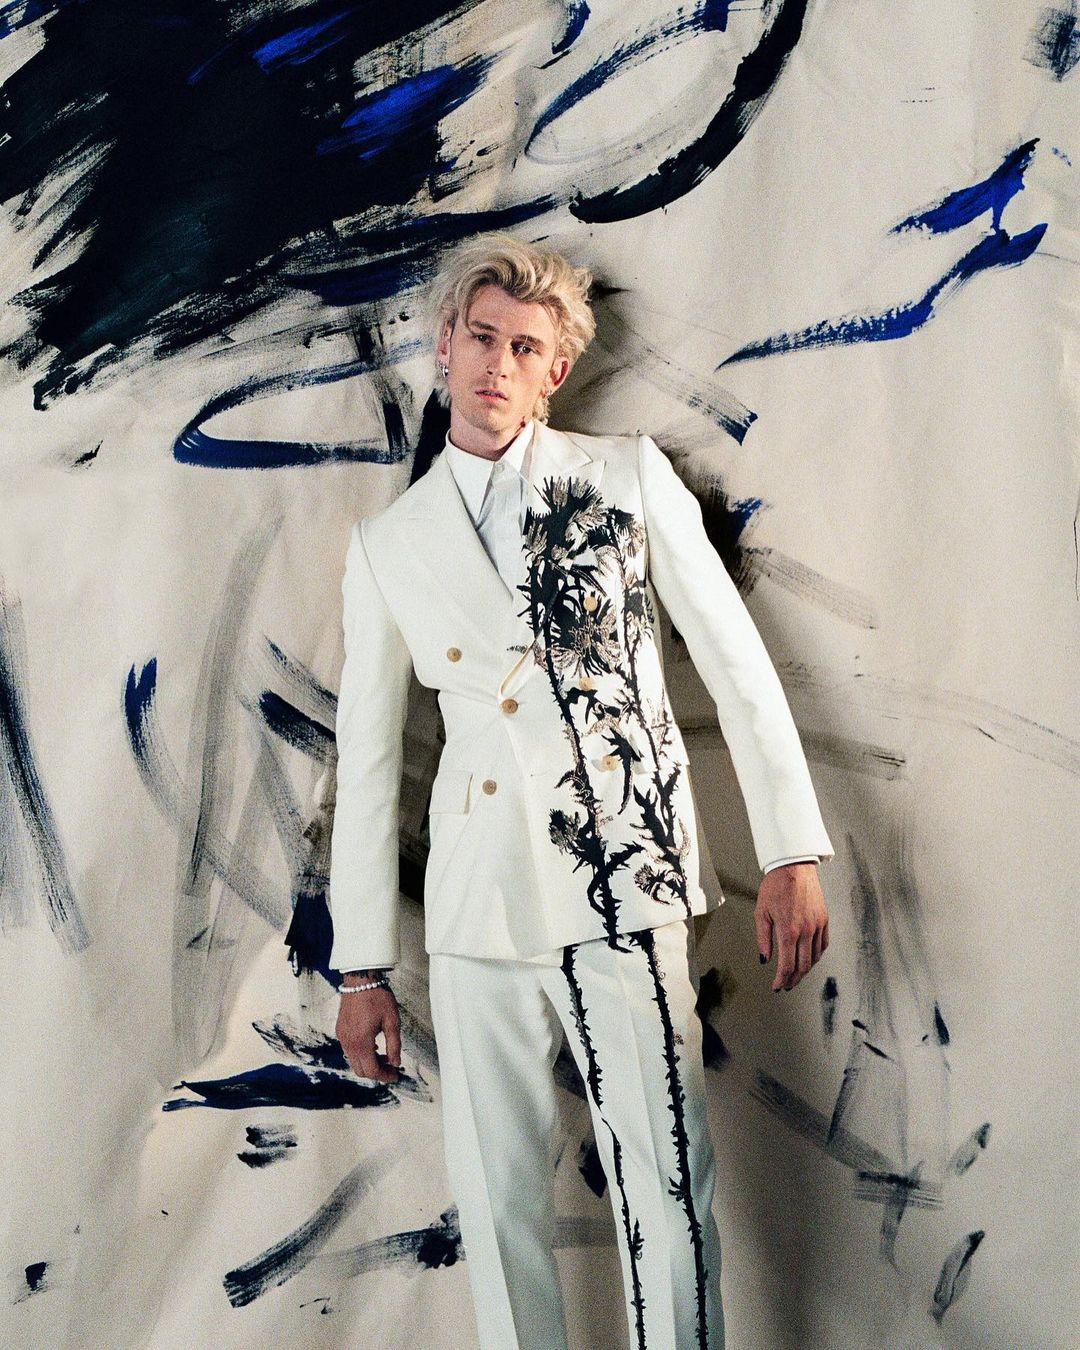 SPOTTED: Machine Gun Kelly in Alexander McQueen for Nylon